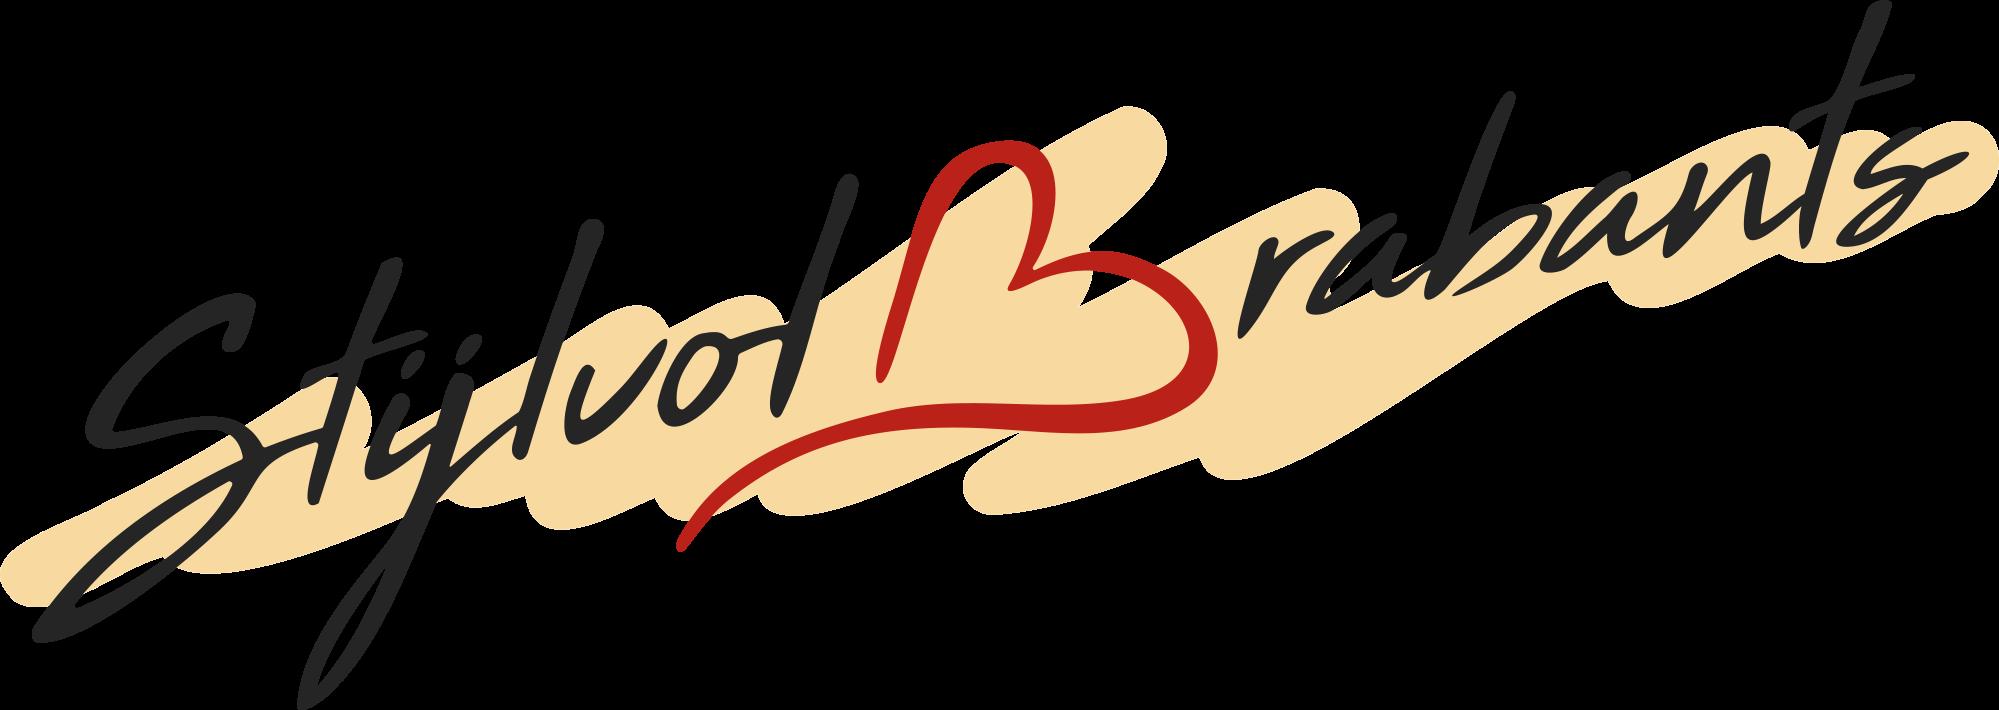 logo stijlvol Brabants